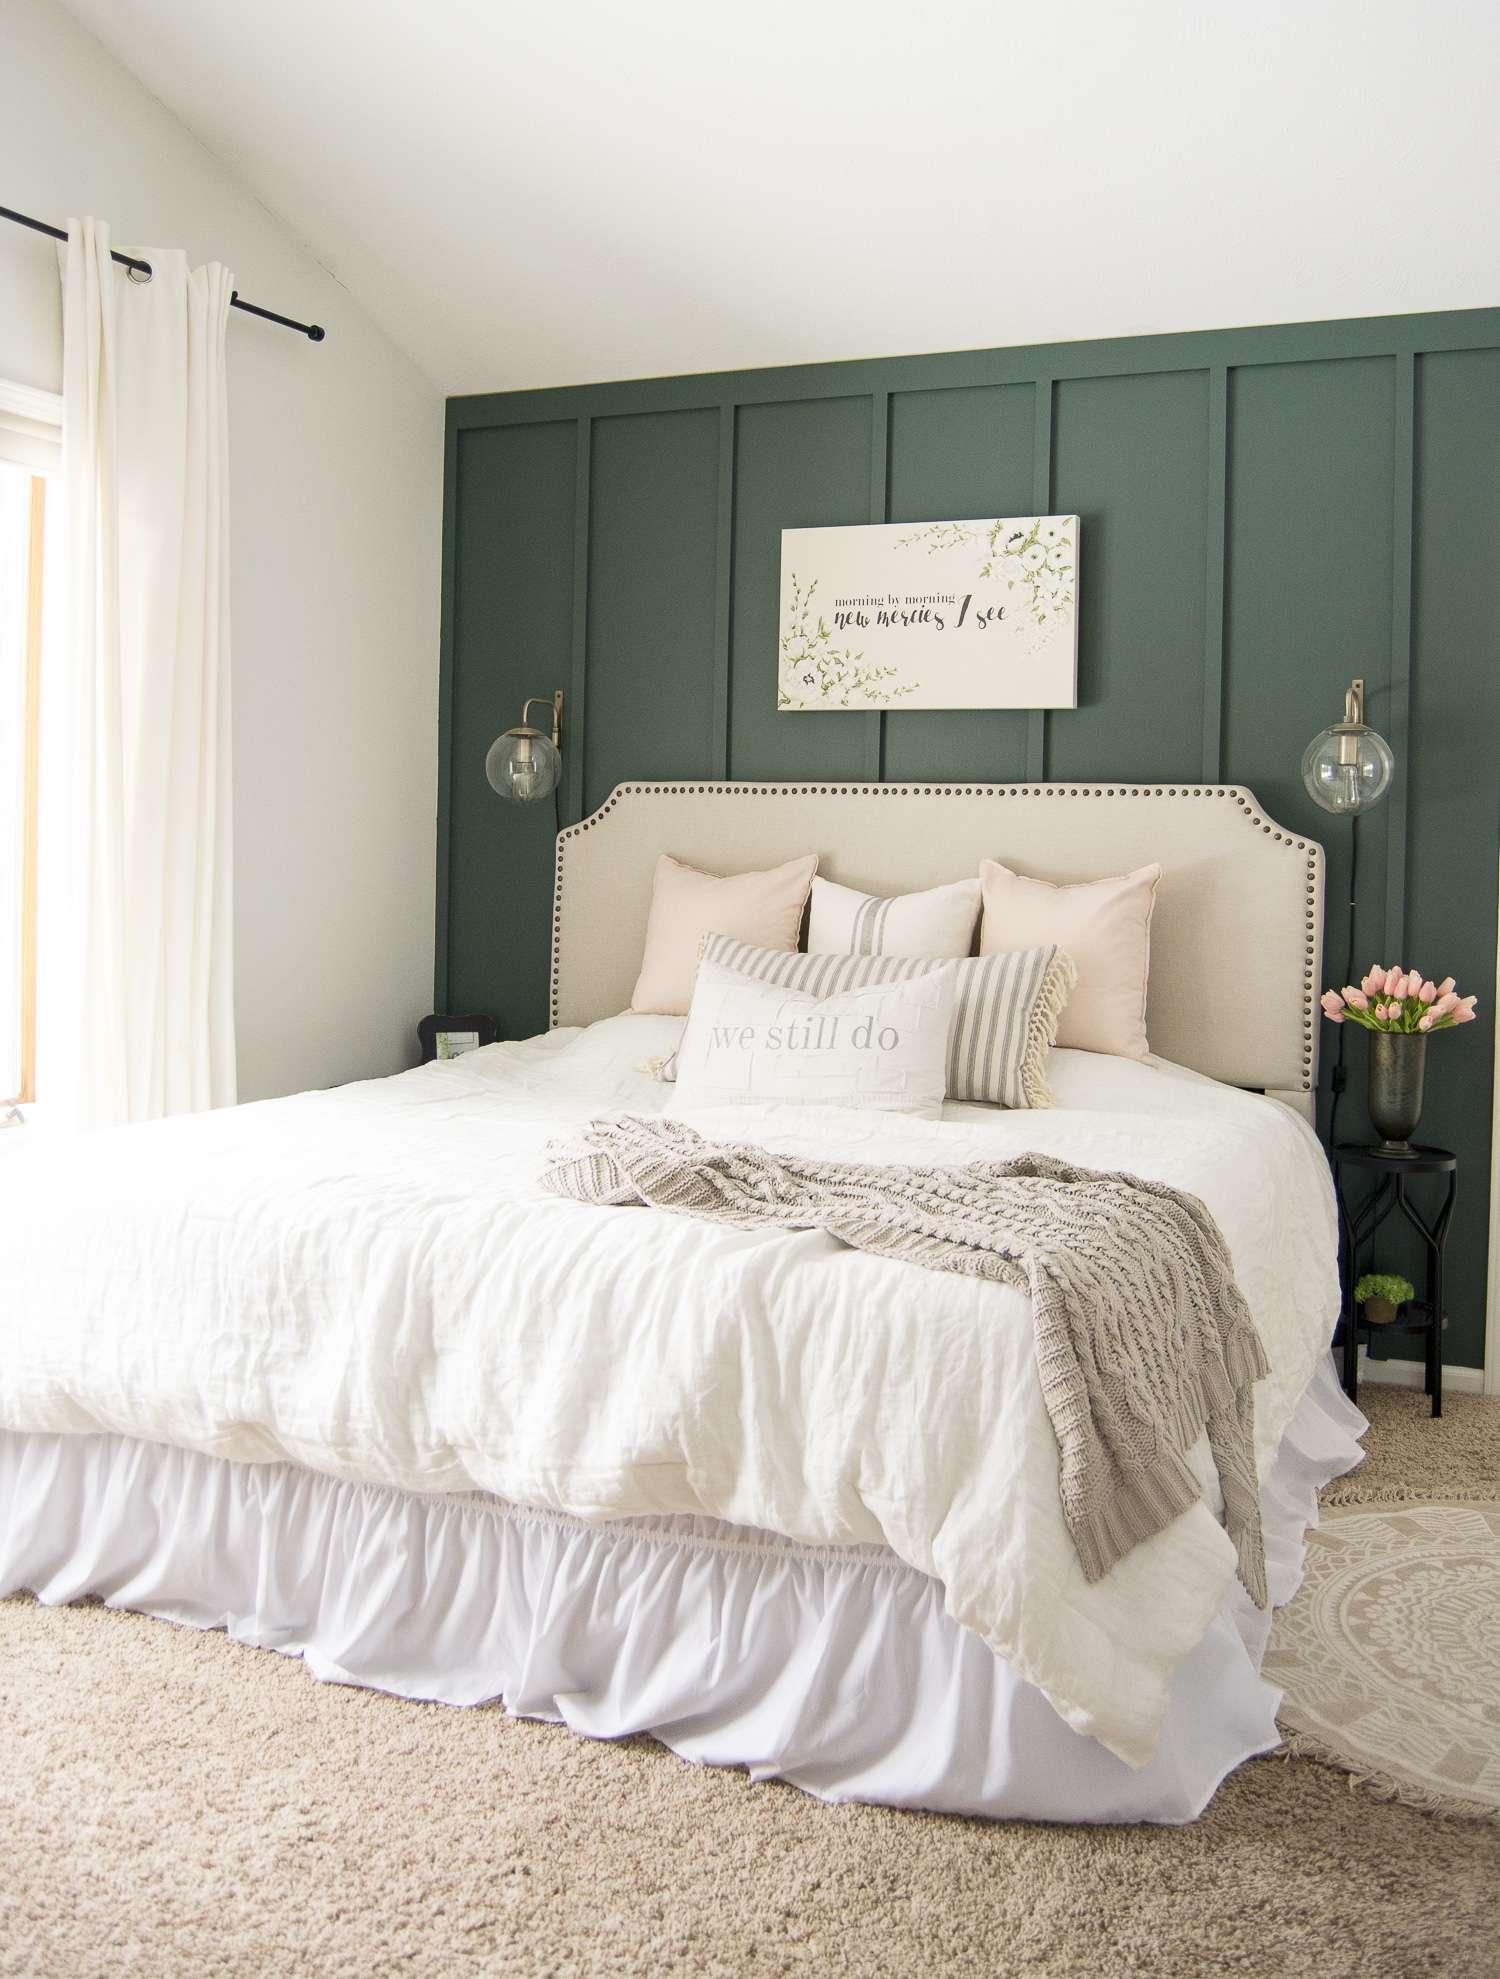 Key elements of a modern farmhouse bedroom.